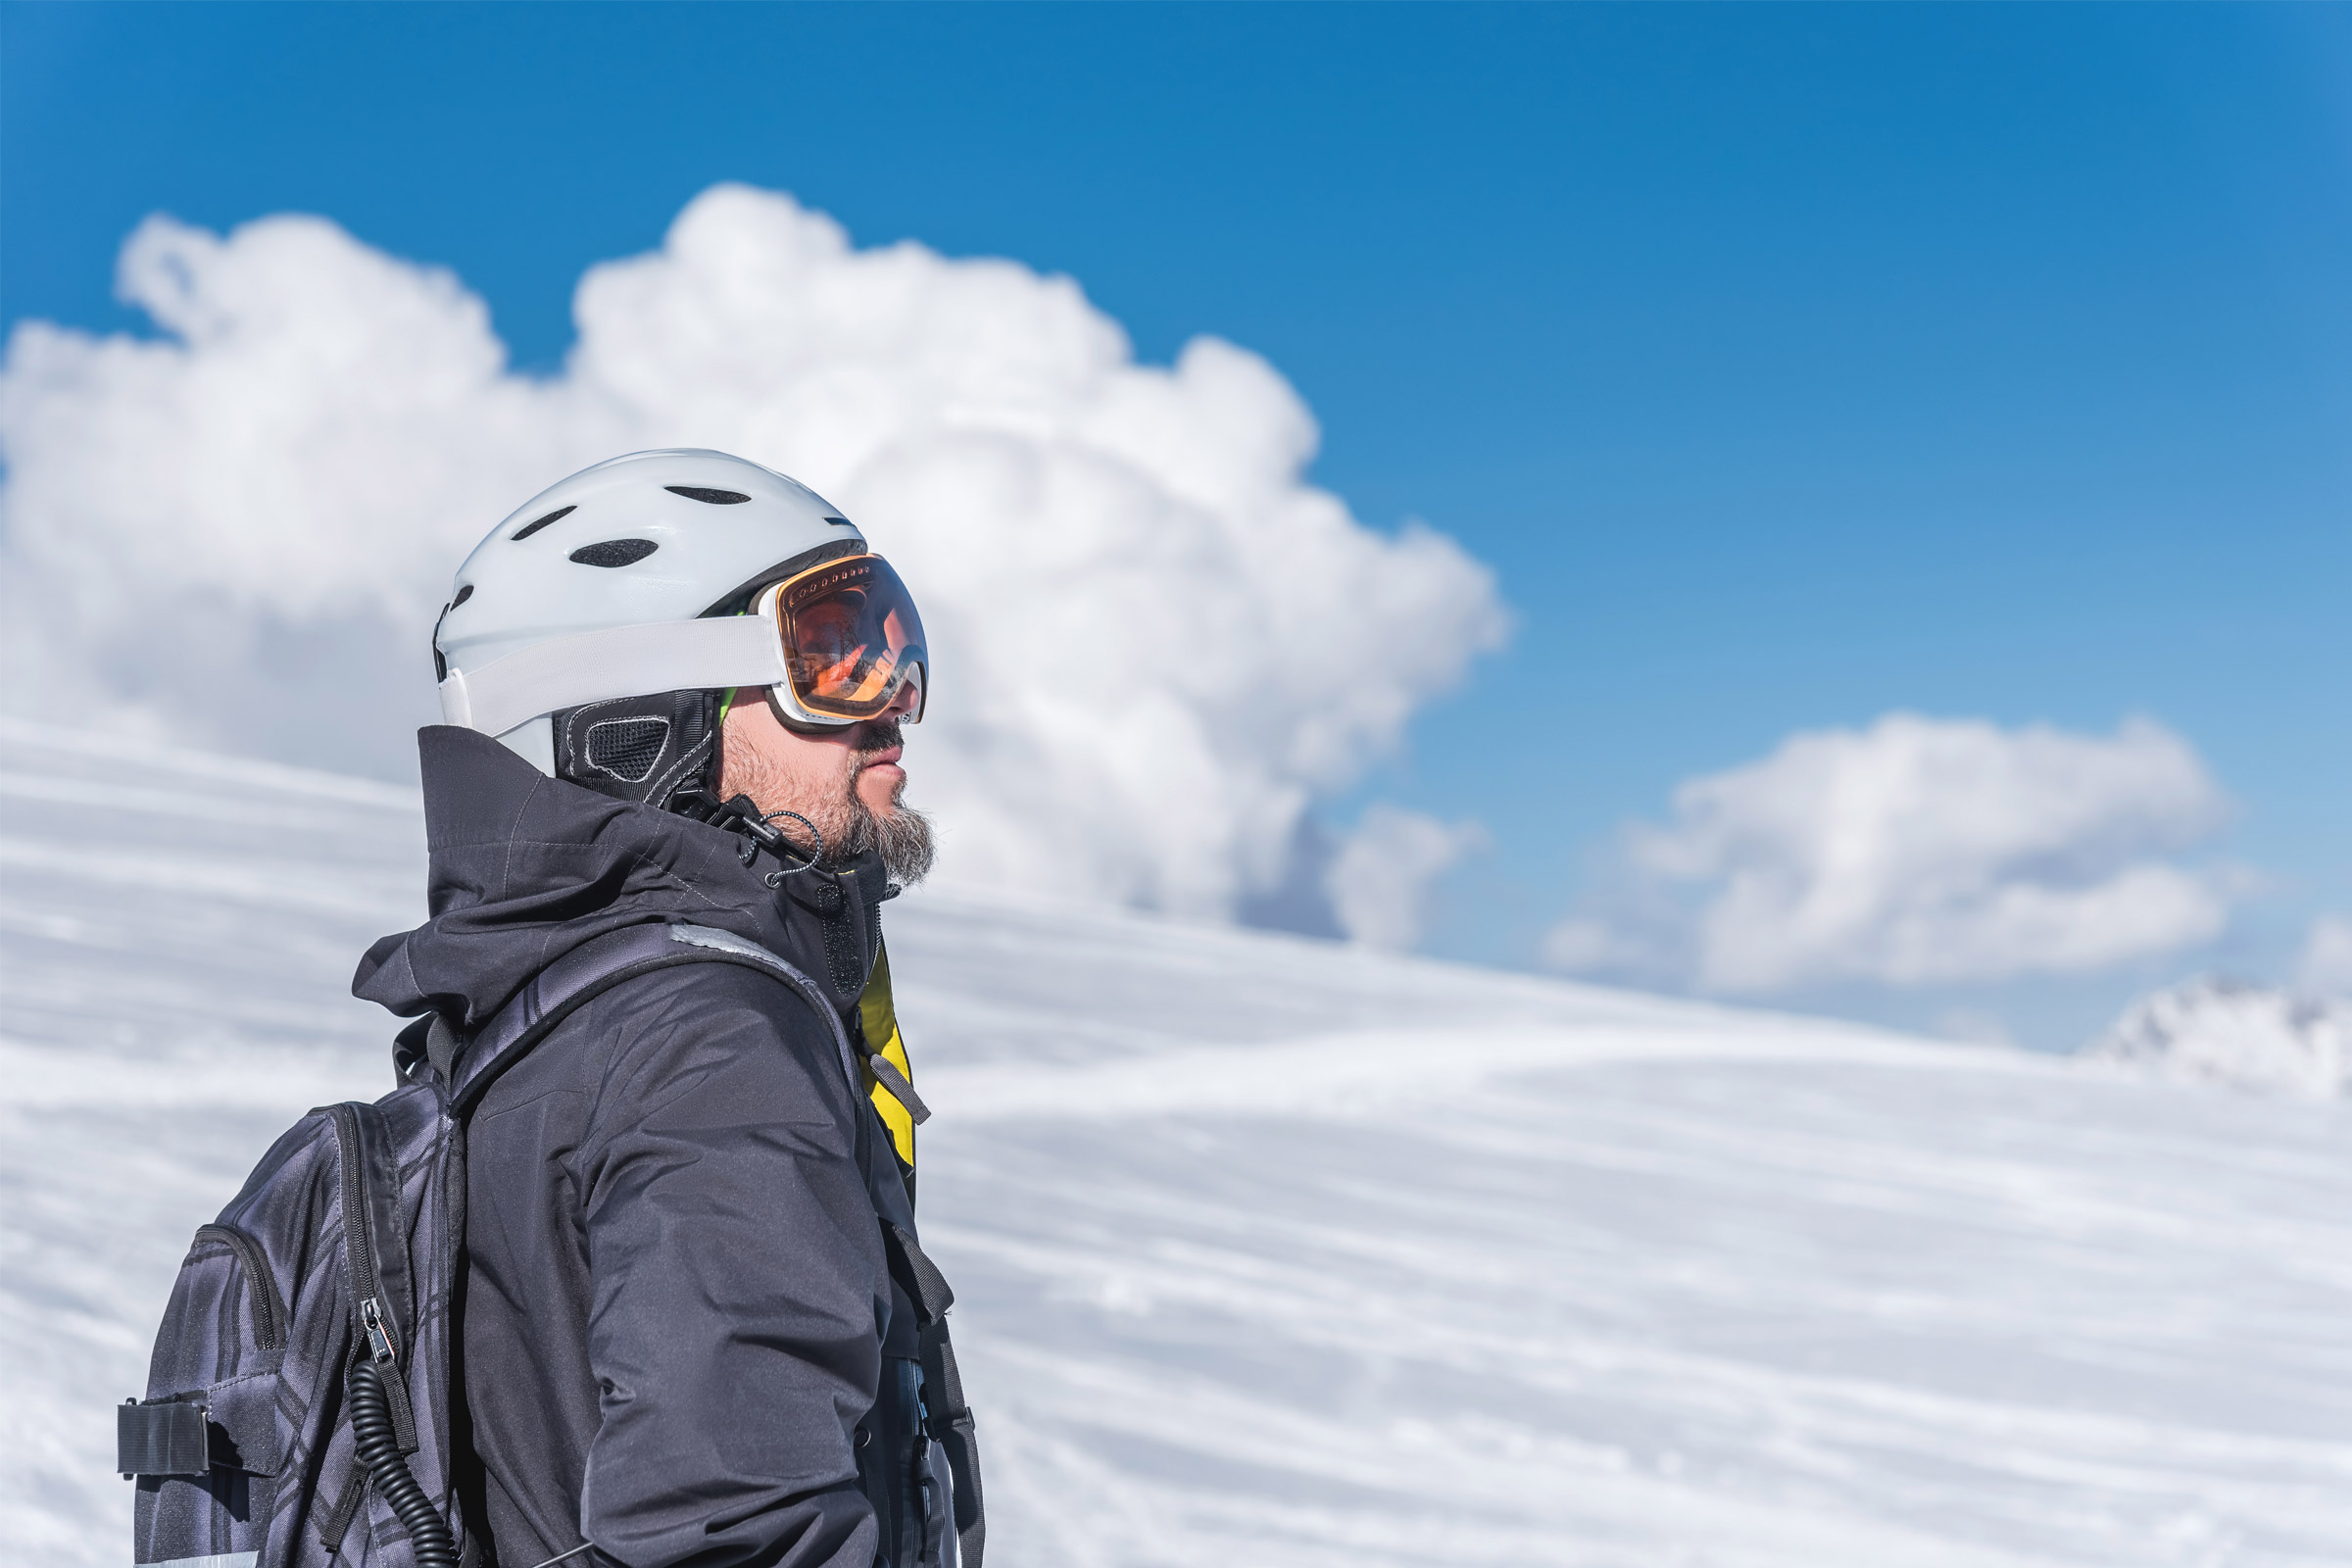 man wearing ski helmet and goggles